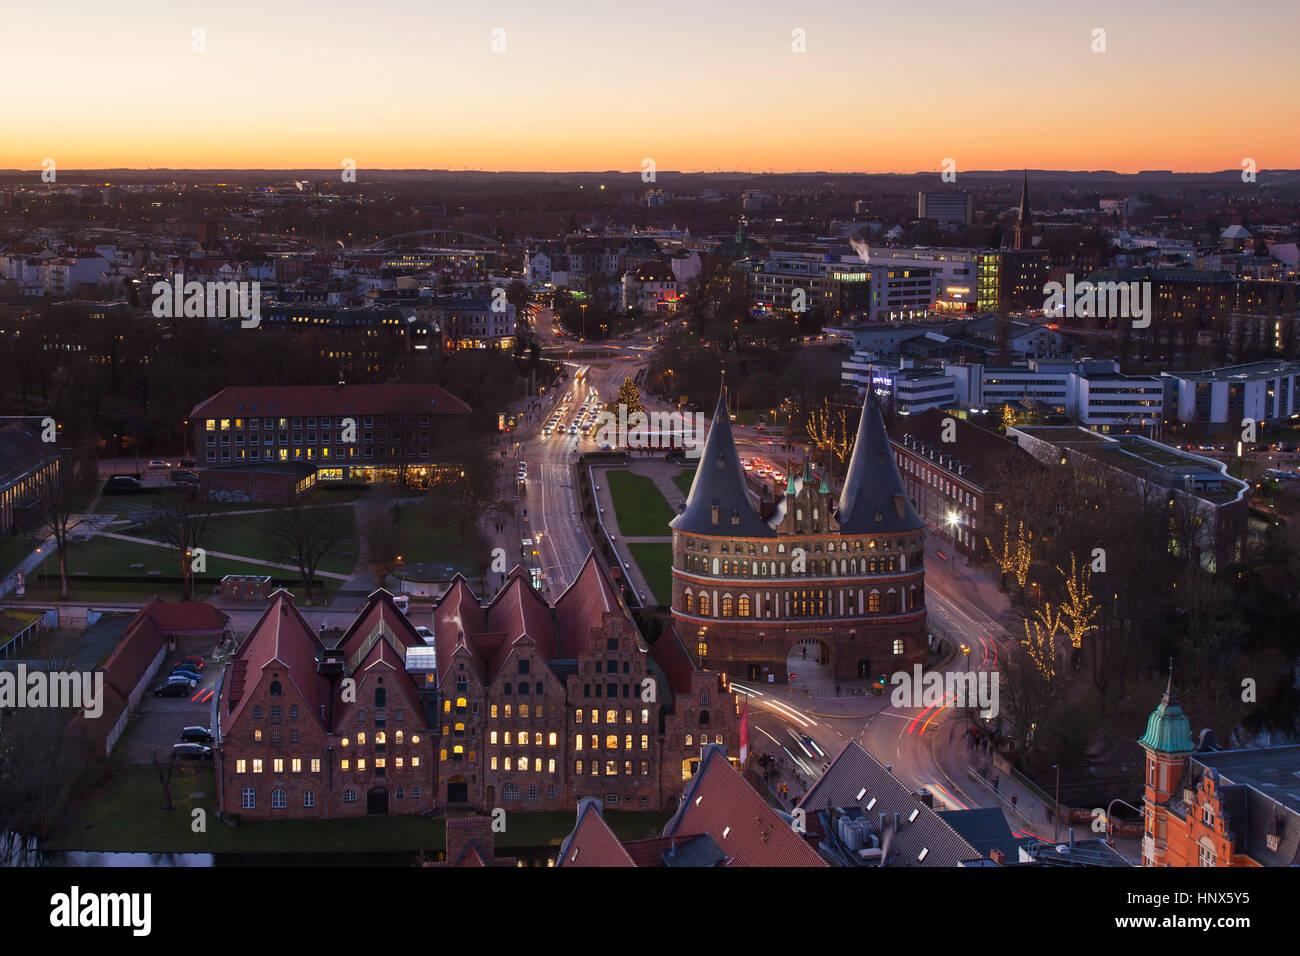 Bird's eye view at dusk over the Holsten Gate / Holstein Tor / Holstentor, Brick Gothic city gate at the Hanseatic - Stock Image